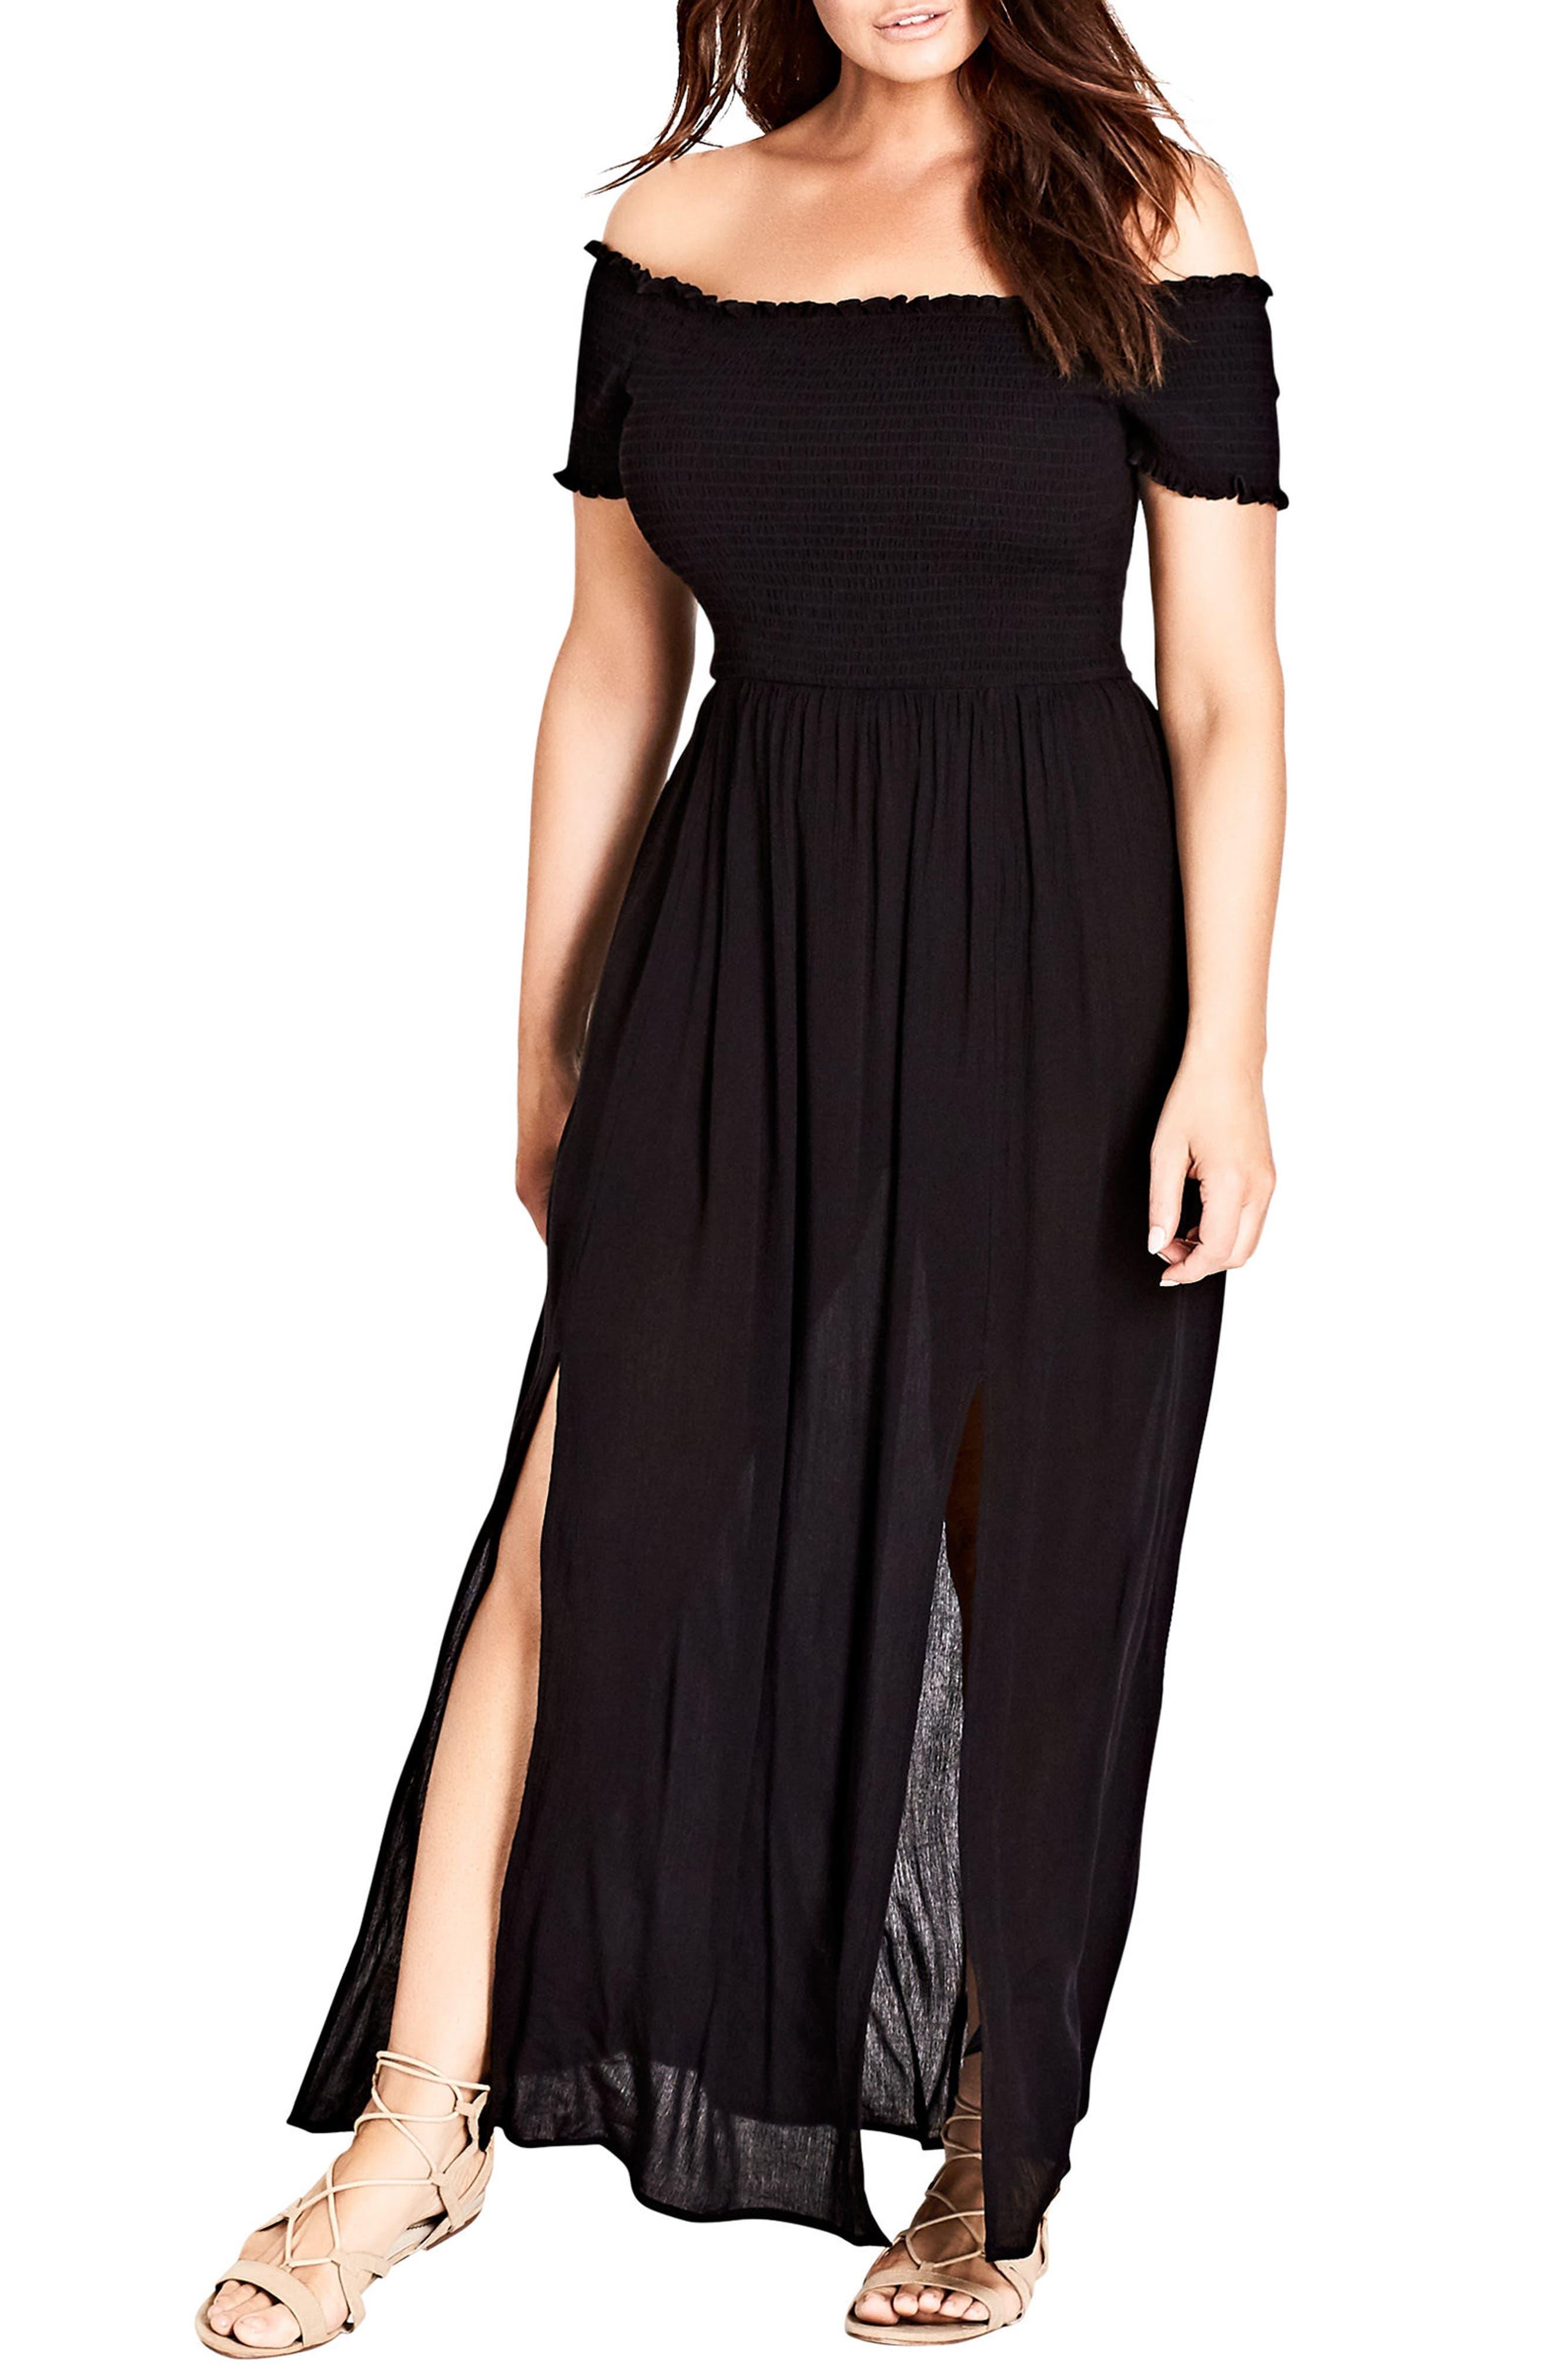 CITY CHIC Smocked Off the Shoulder Maxi Dress, Main, color, BLACK